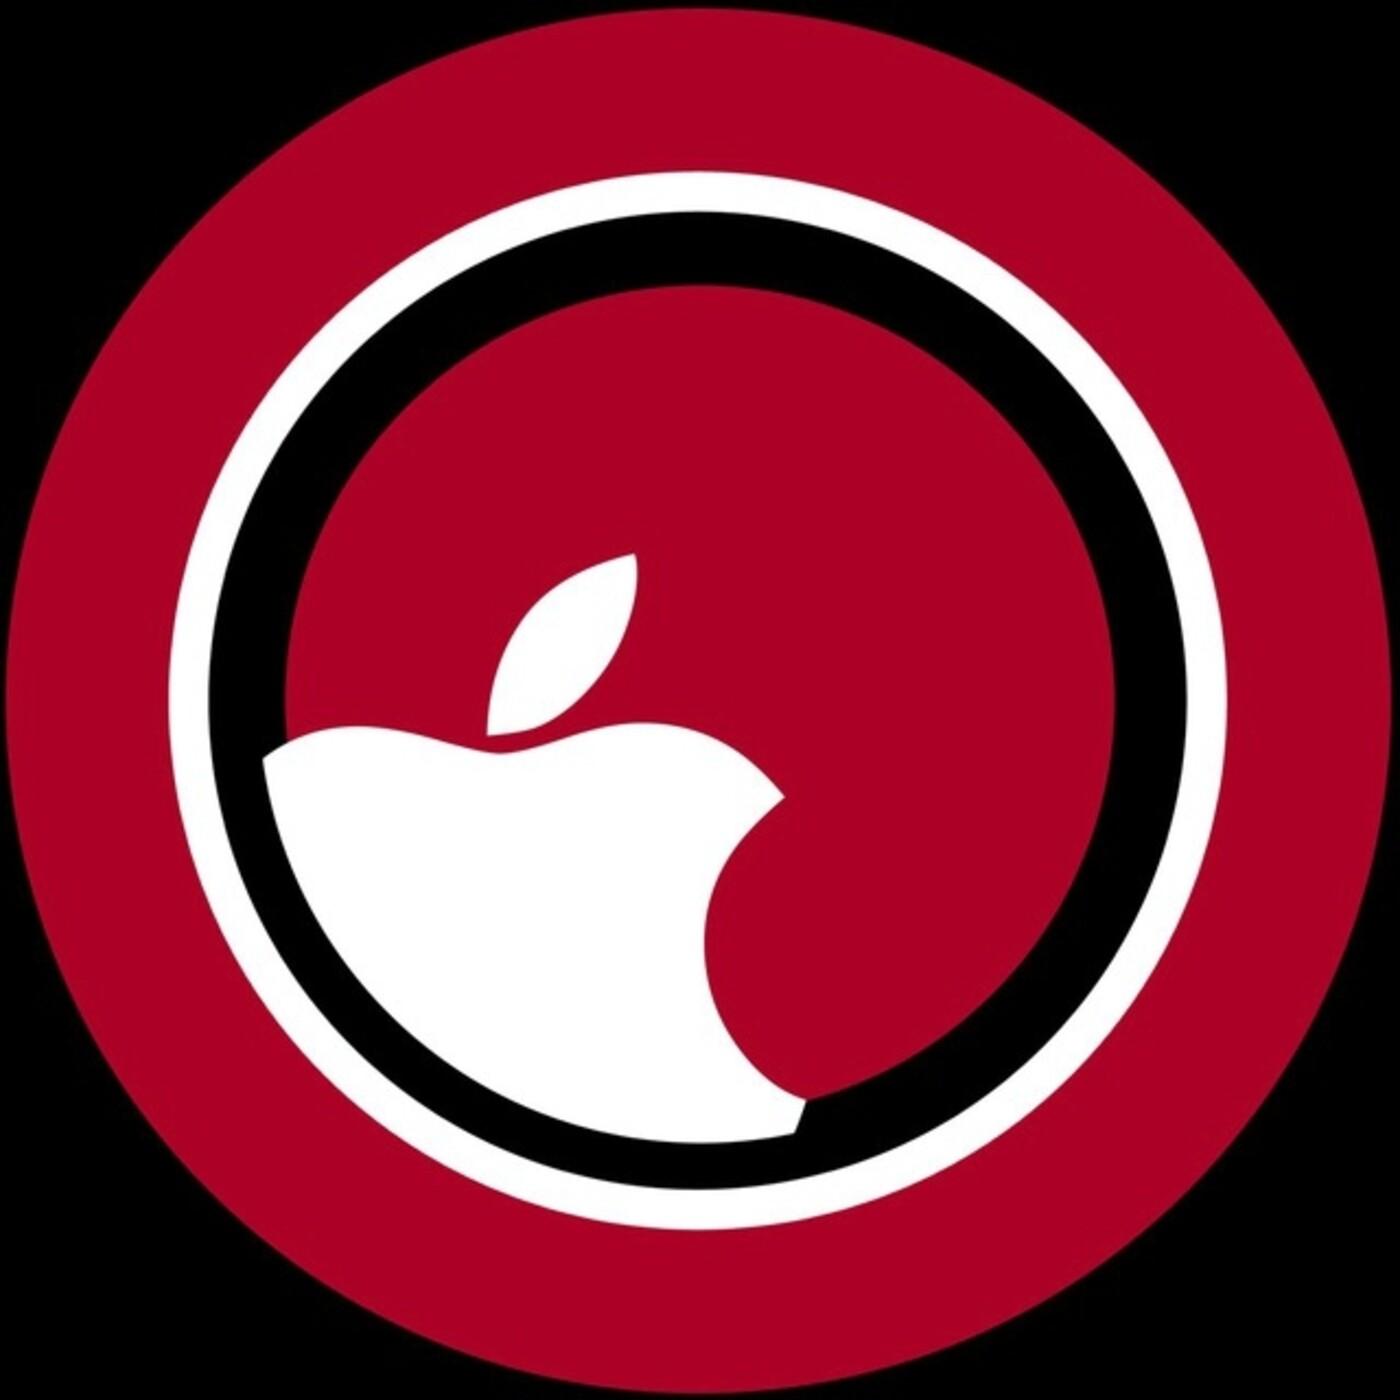 Episodio 44: La era PostPc llego a Distrito Apple - Magic Keyboard